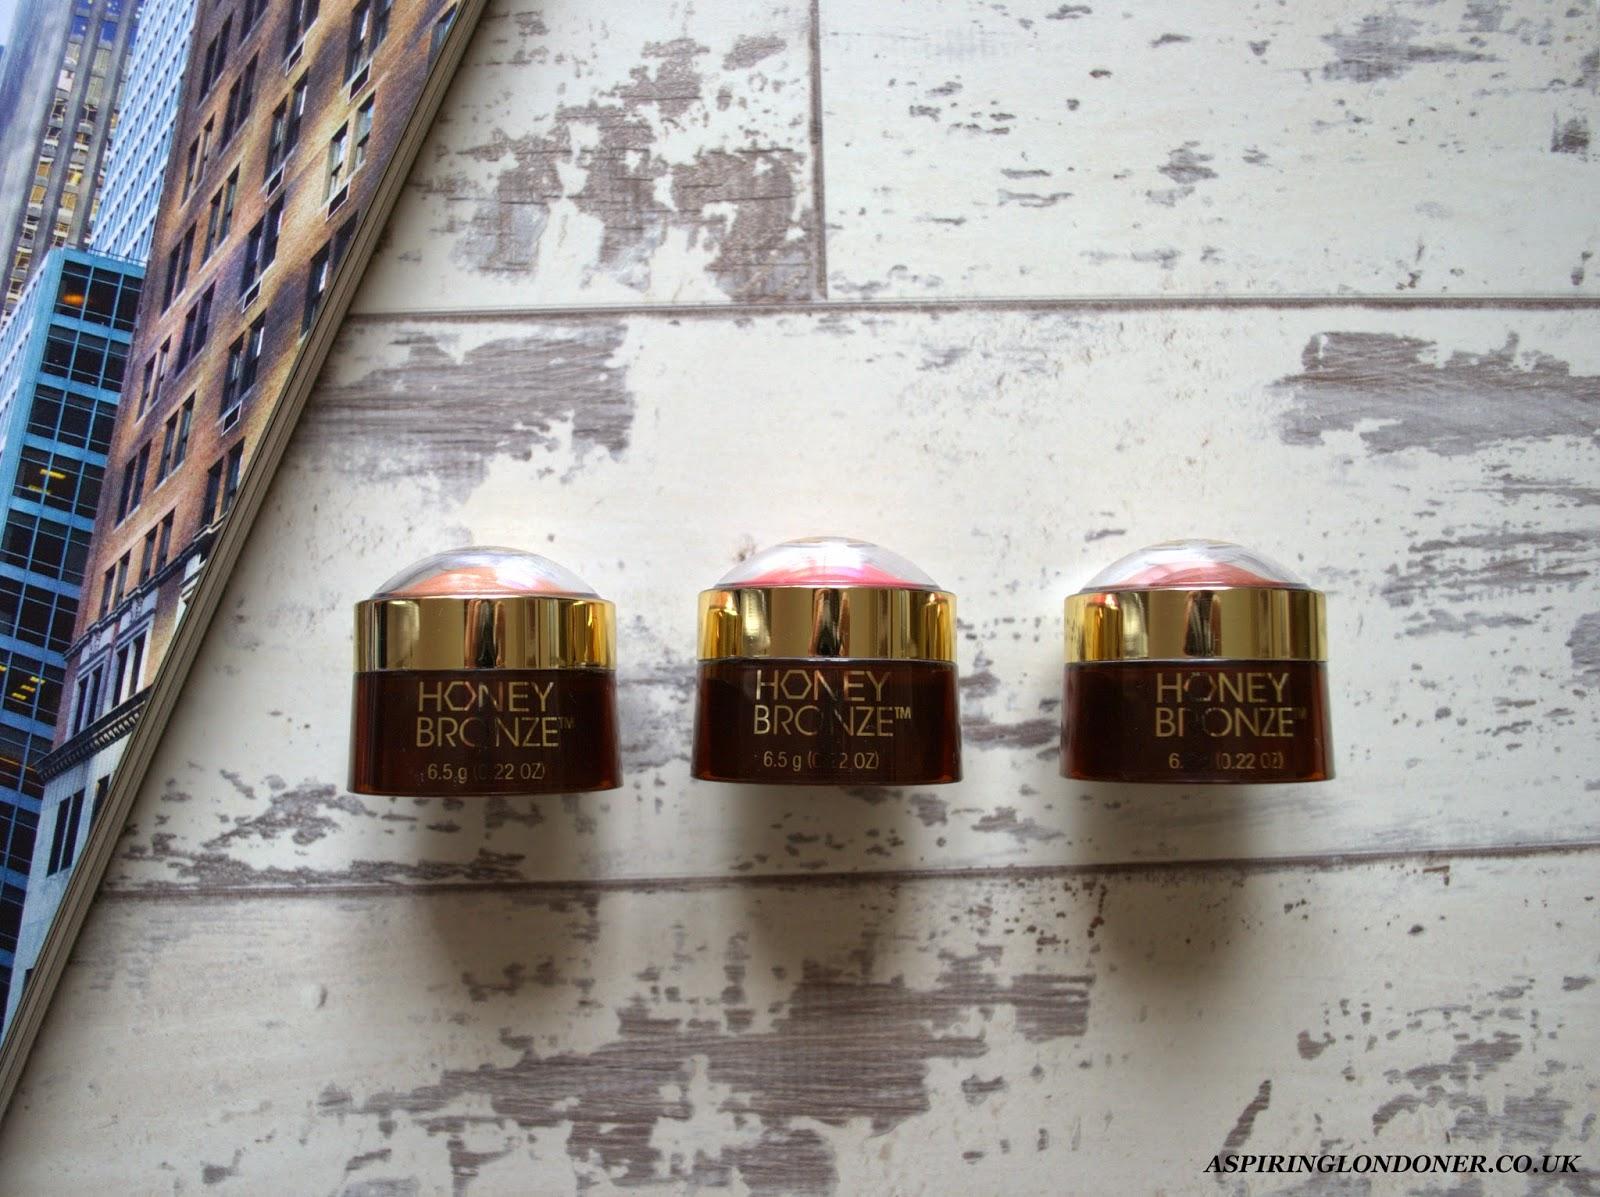 The Body Shop Honey Bronze Highlighting Dome Review - Aspiring Londoner